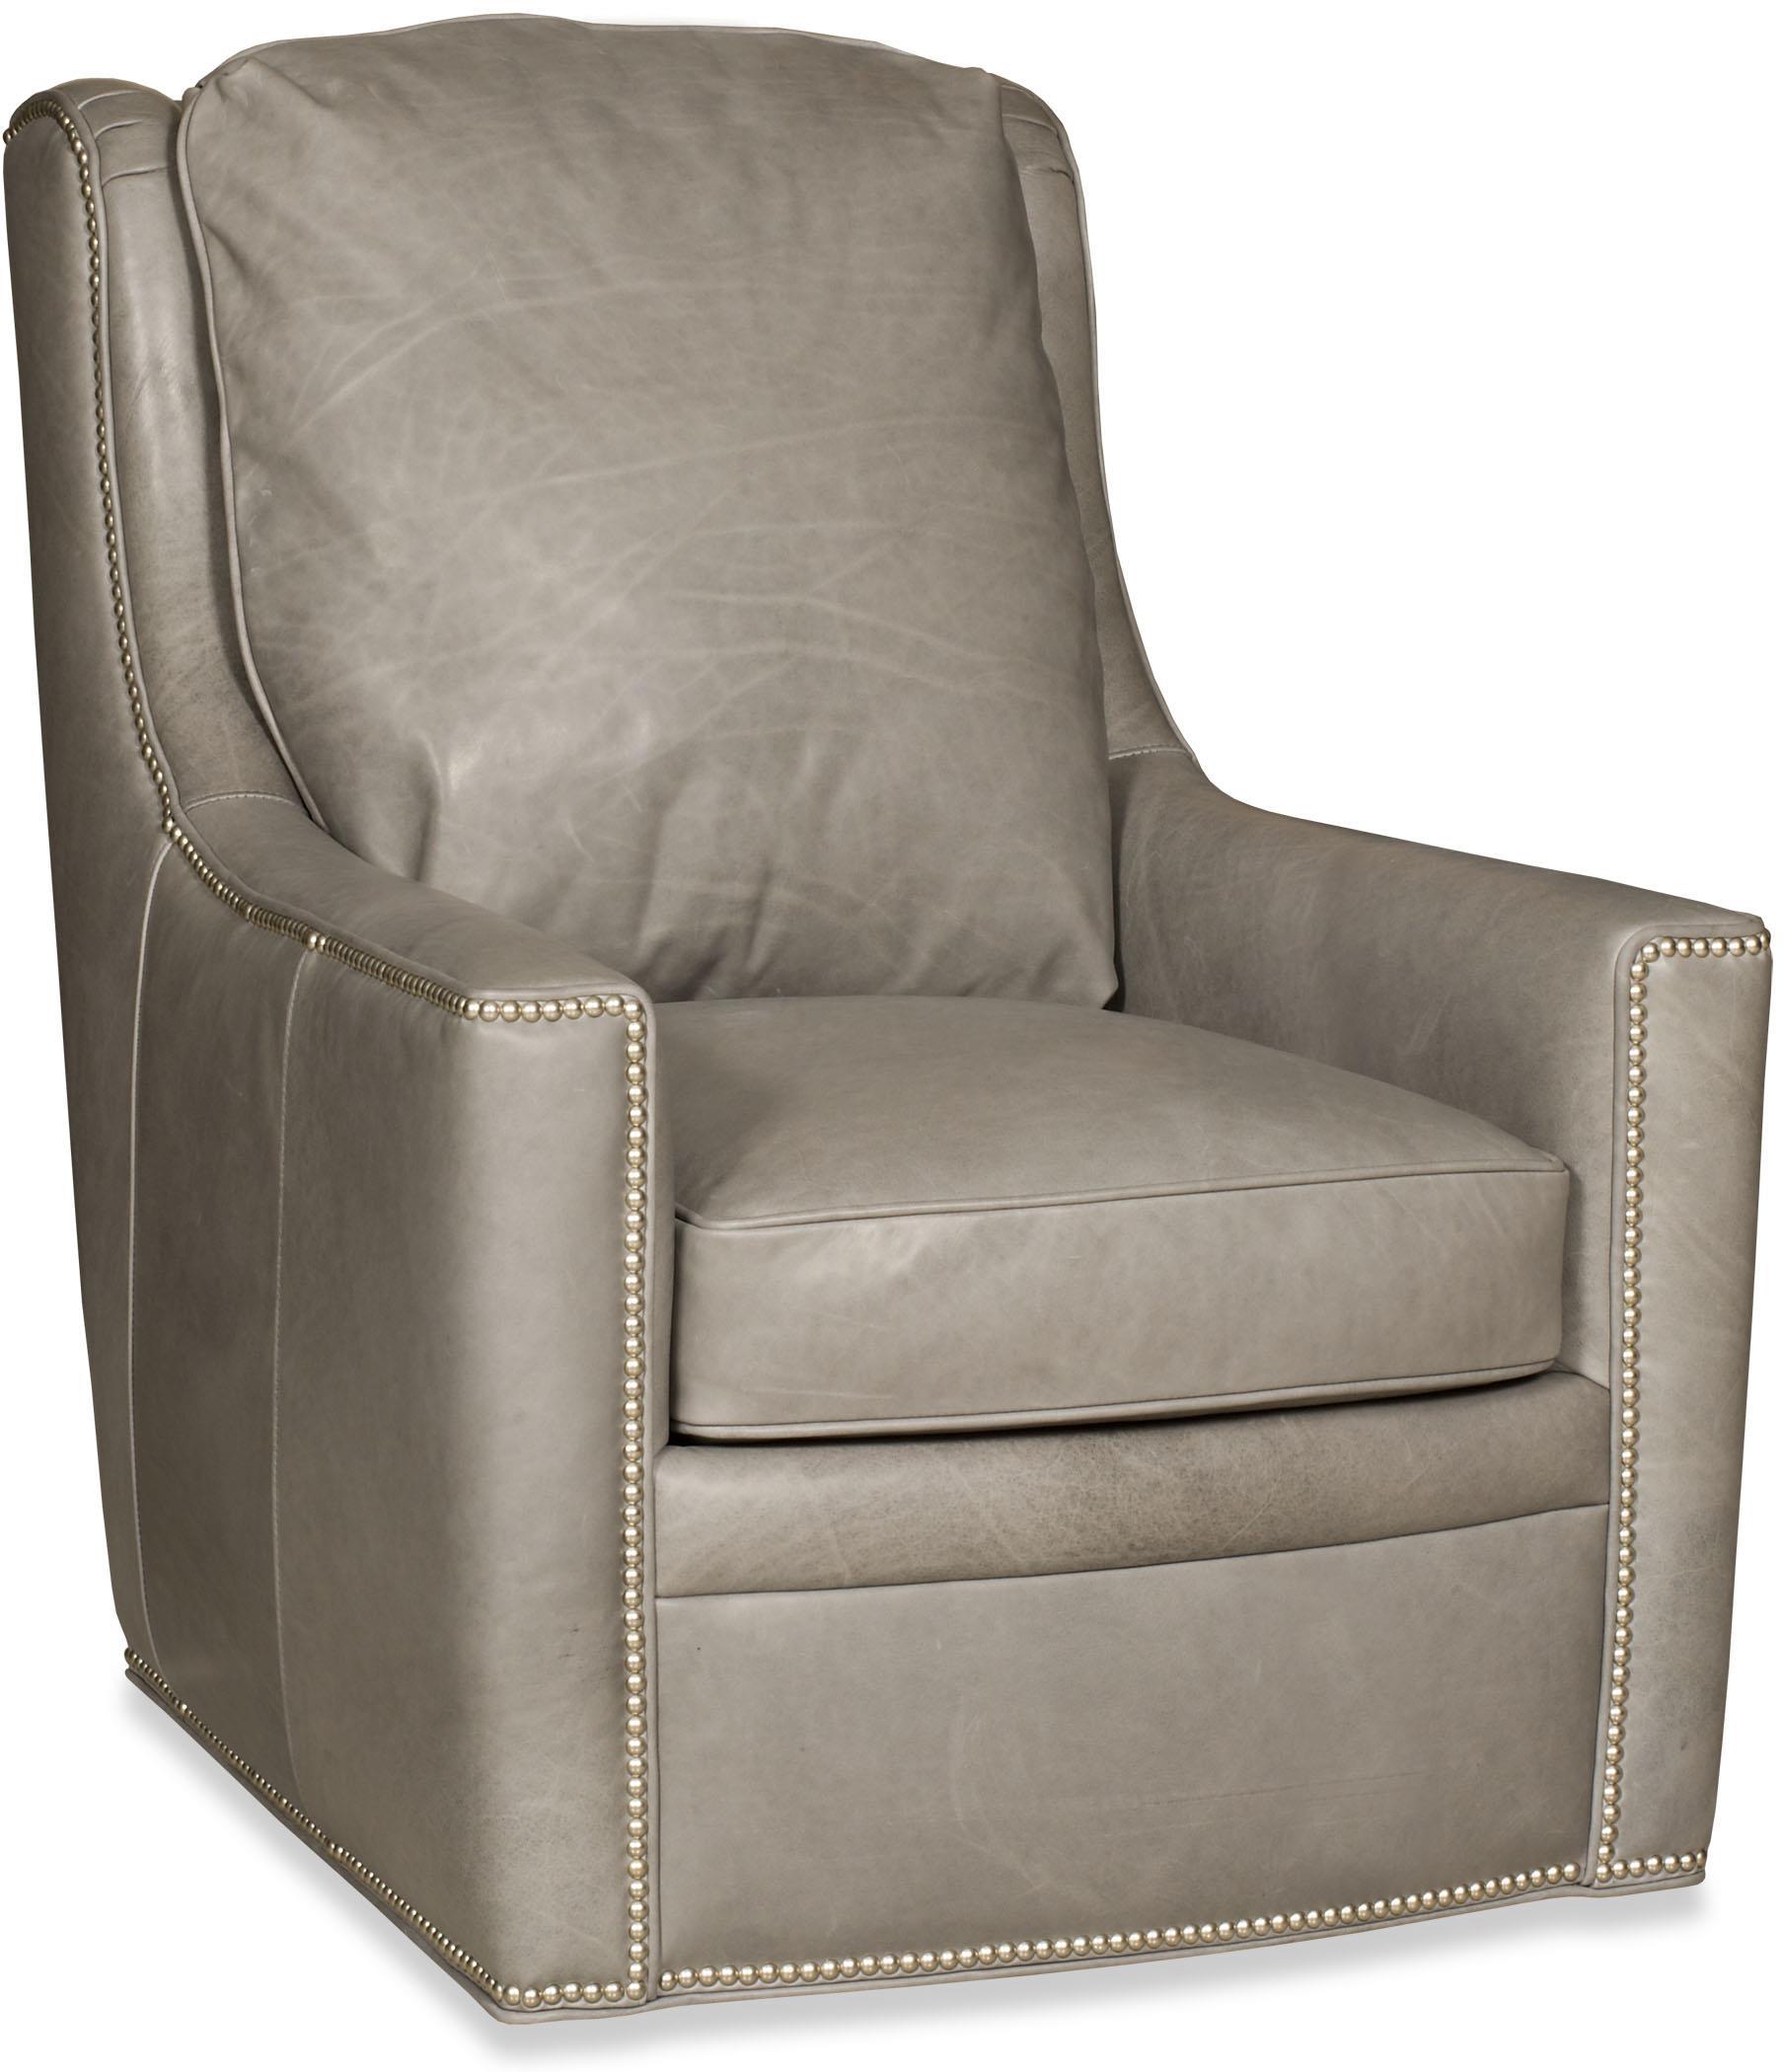 Attrayant Bradington Young Swivel Tub Chairs Percy Swivel Tub Chair